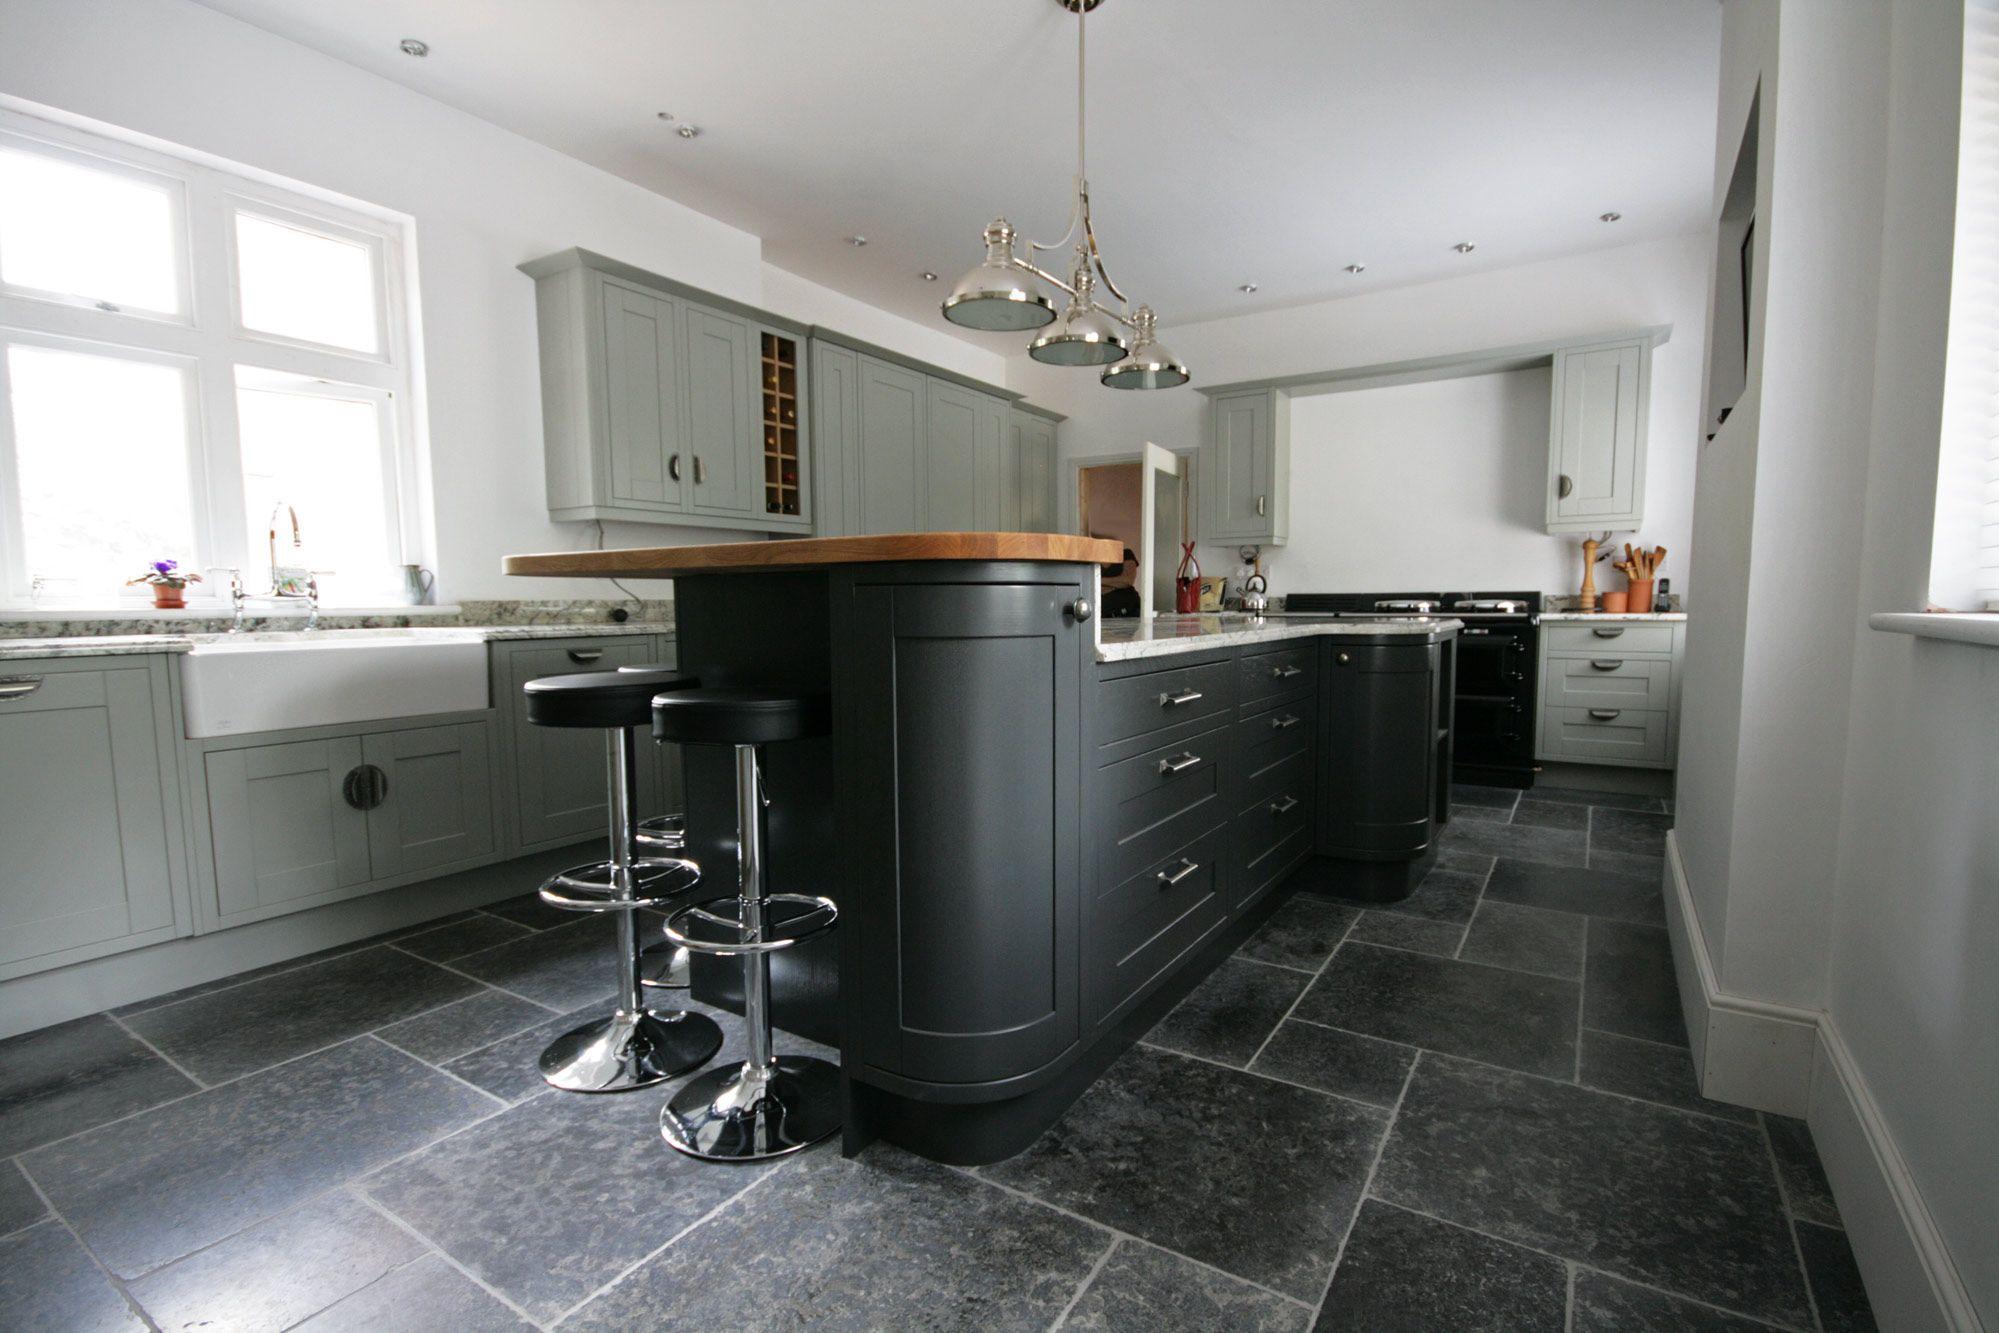 Picture of kitchen millstone limestone flooring tiles lovely picture of kitchen millstone limestone flooring tiles doublecrazyfo Image collections